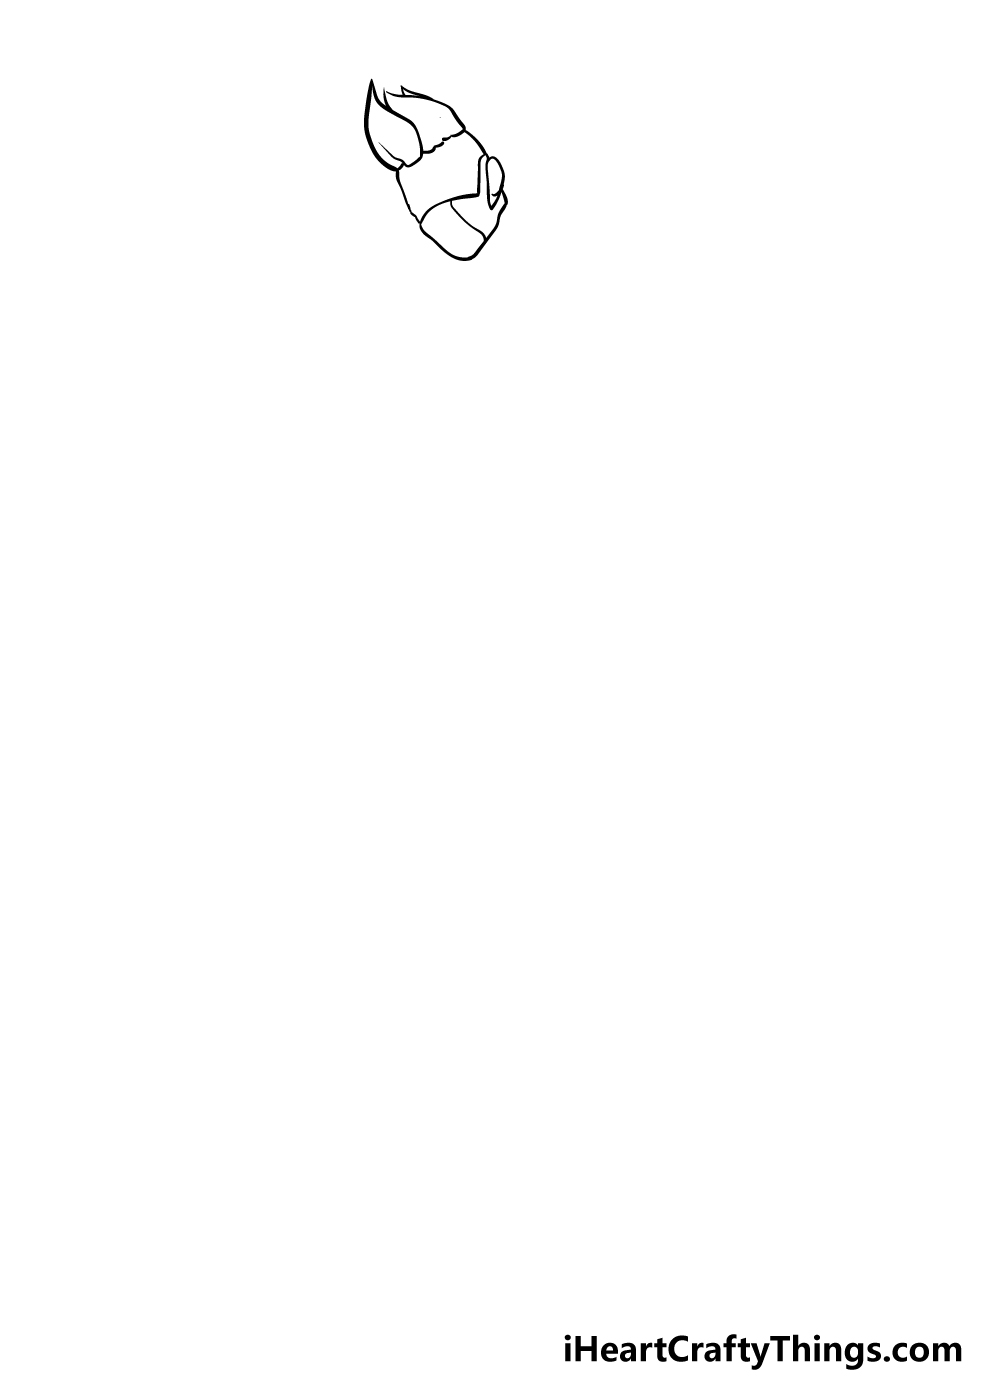 fortnite drawing step 2